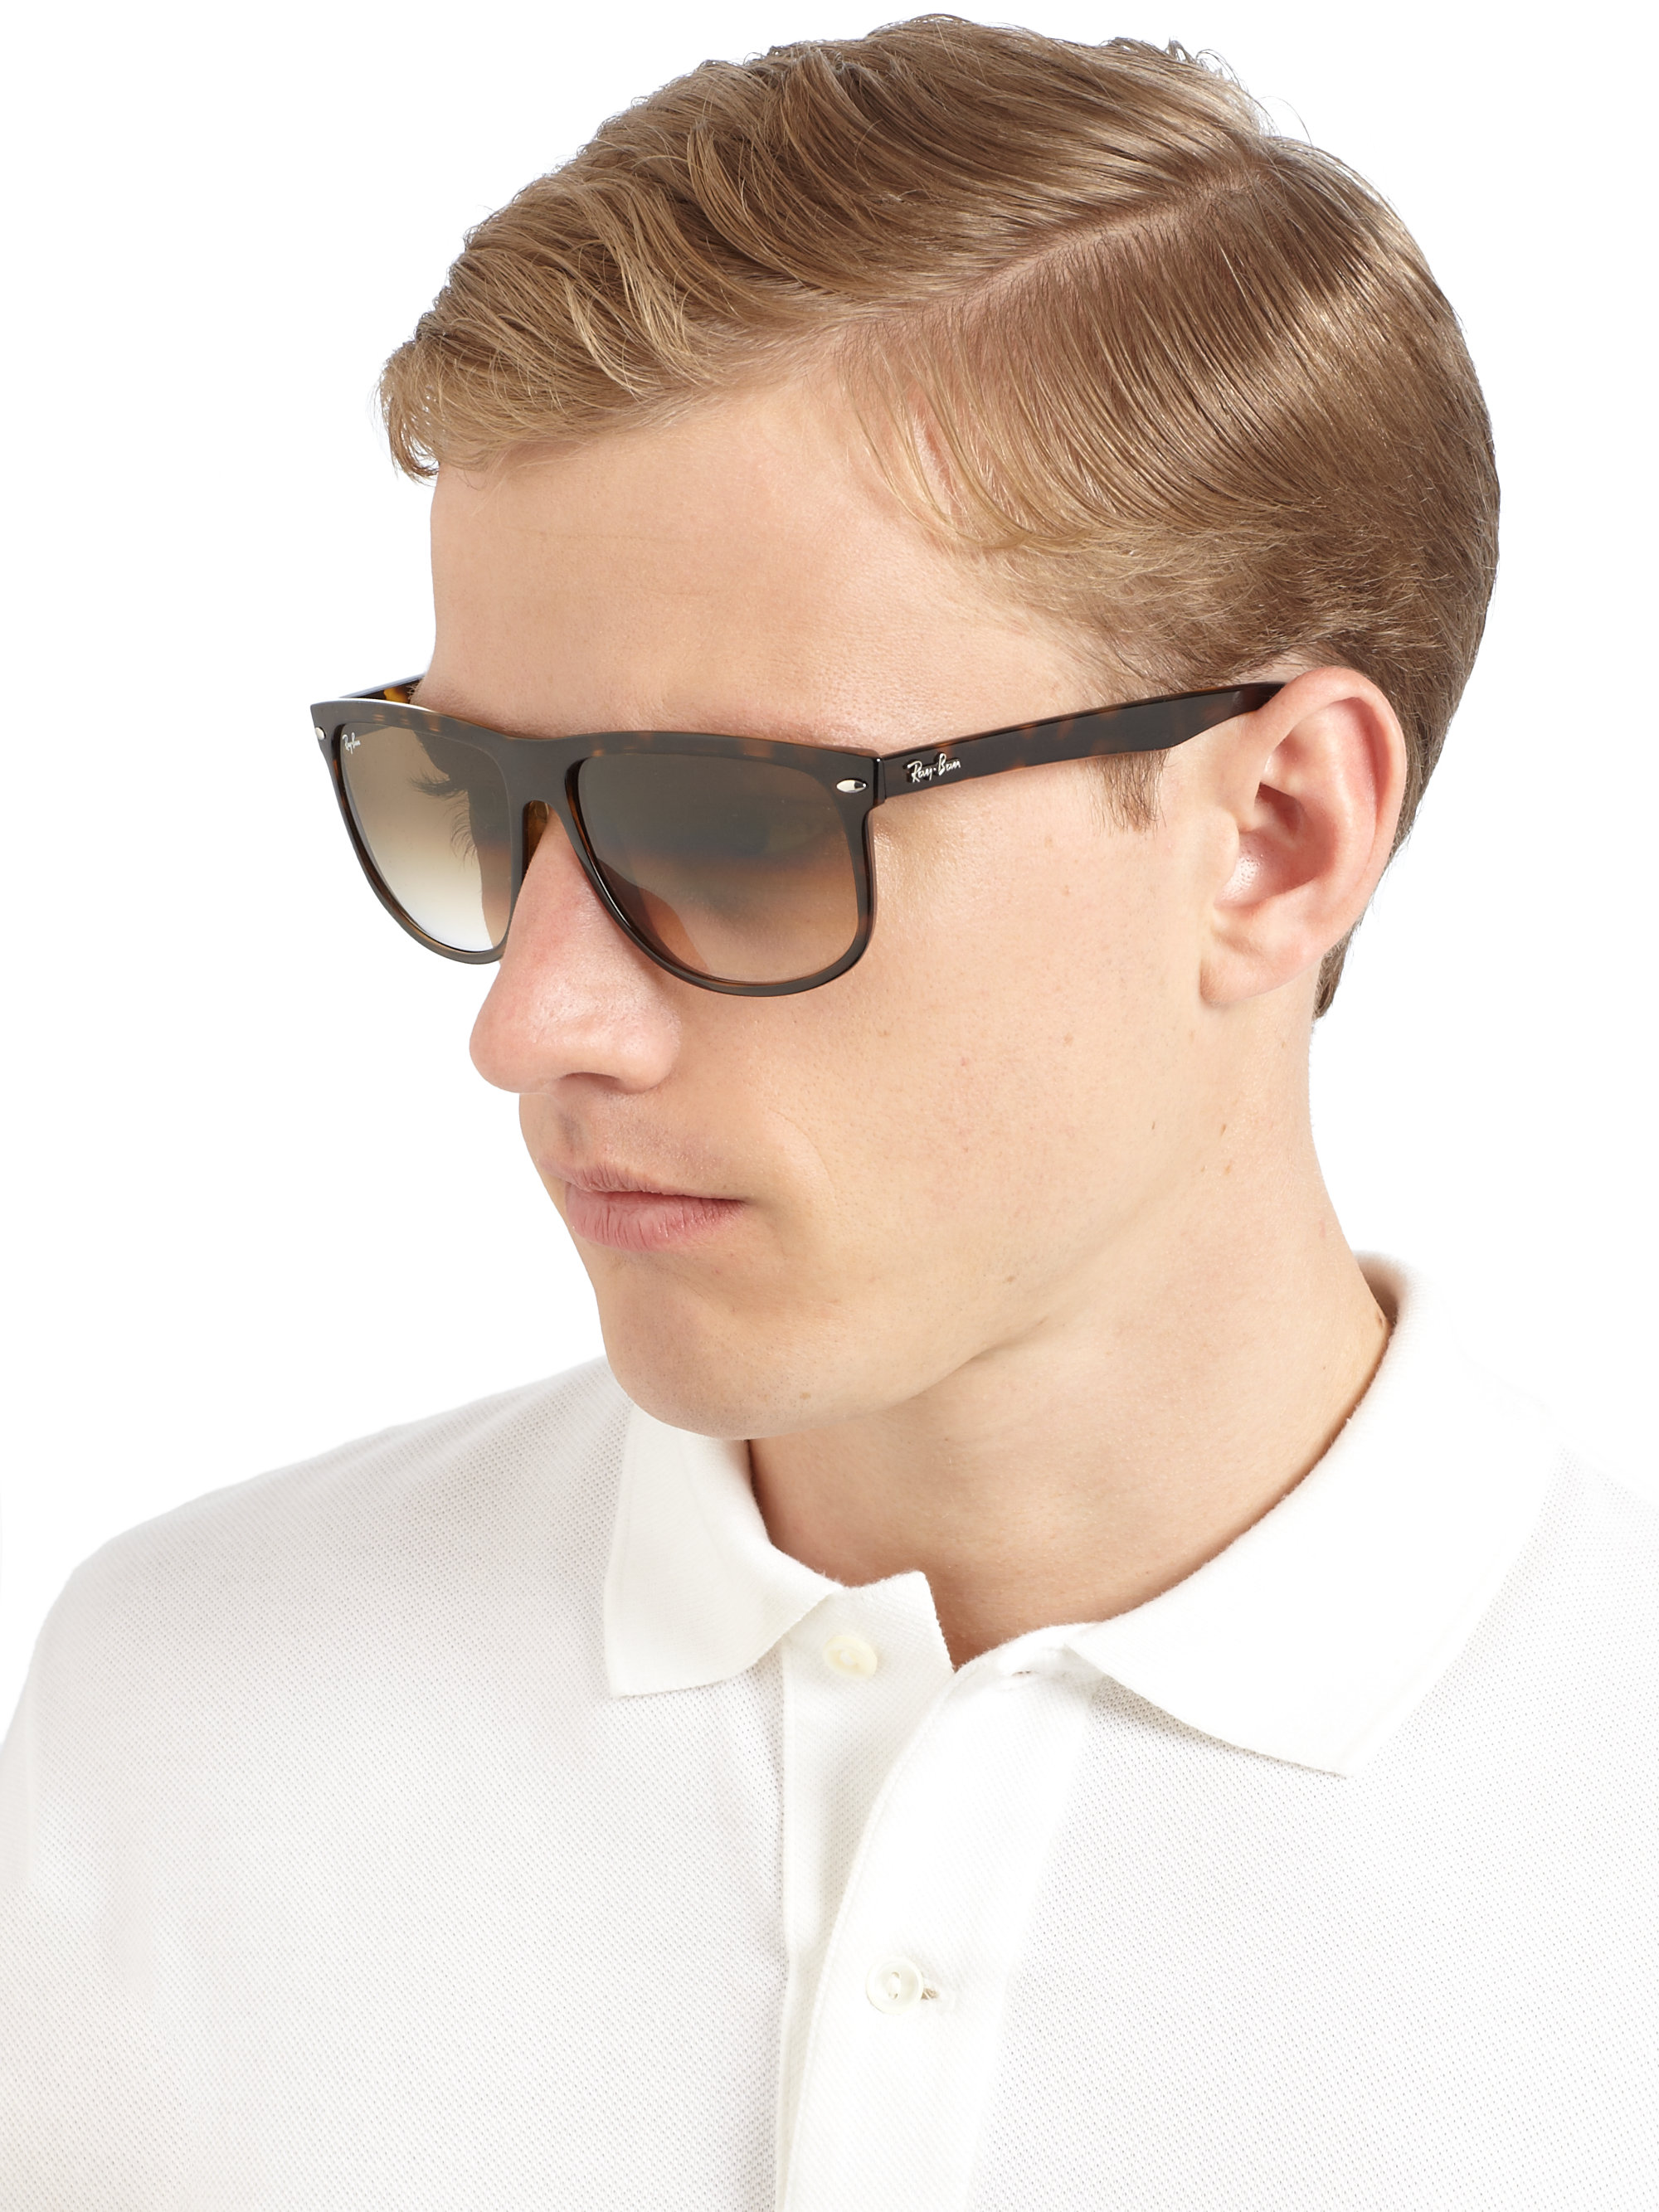 Ray Ban Flat Top Boyfriend Sunglasses In Black For Men Lyst